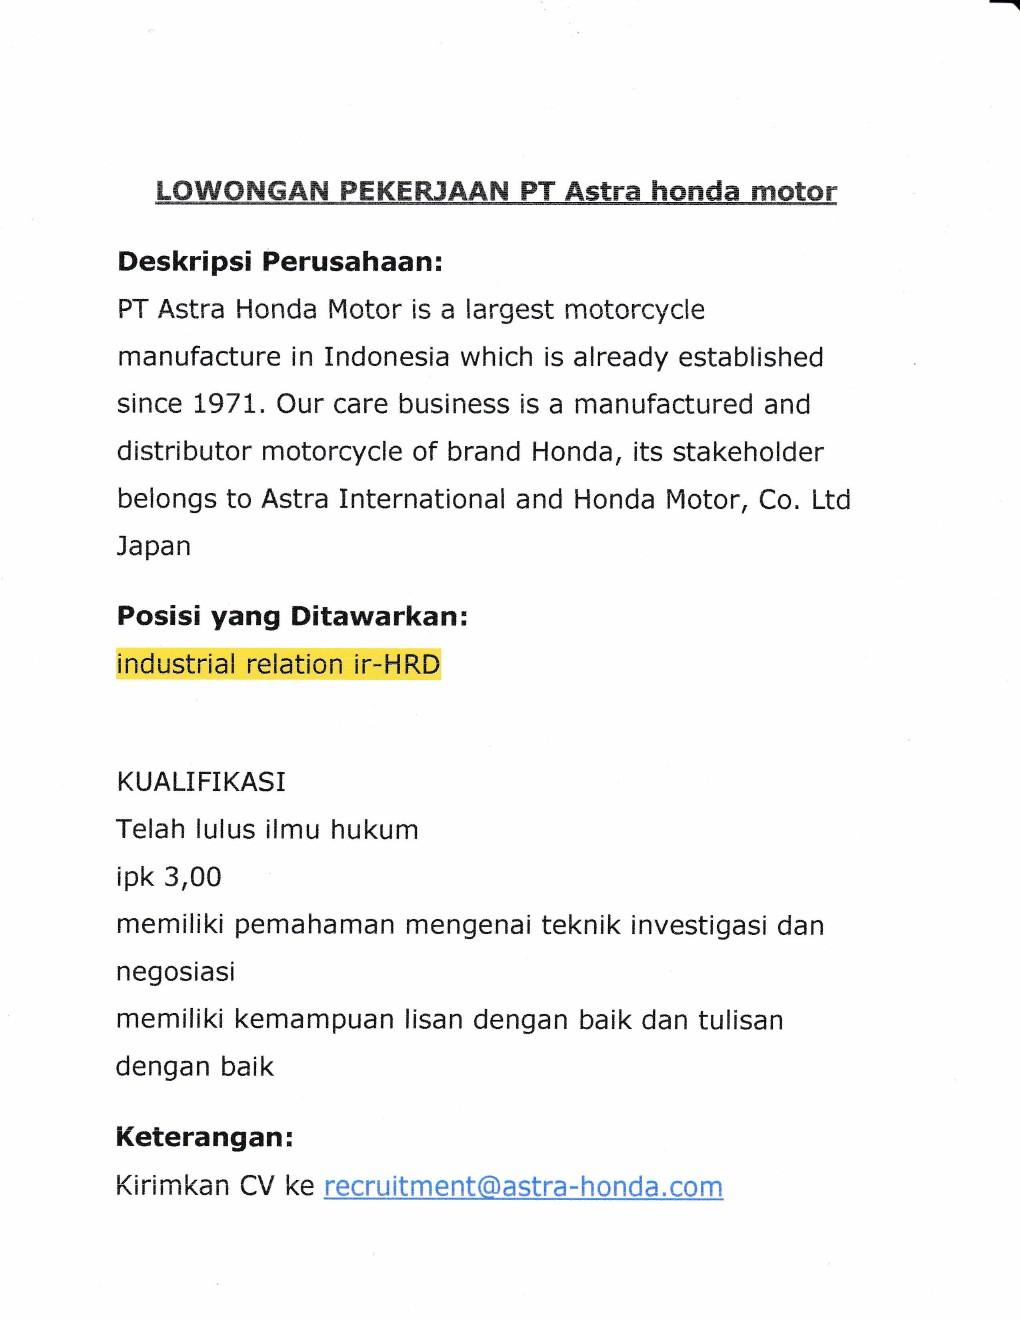 Pt Astra Honda Motor Industrial Relation Kantor Kemahasiswaan